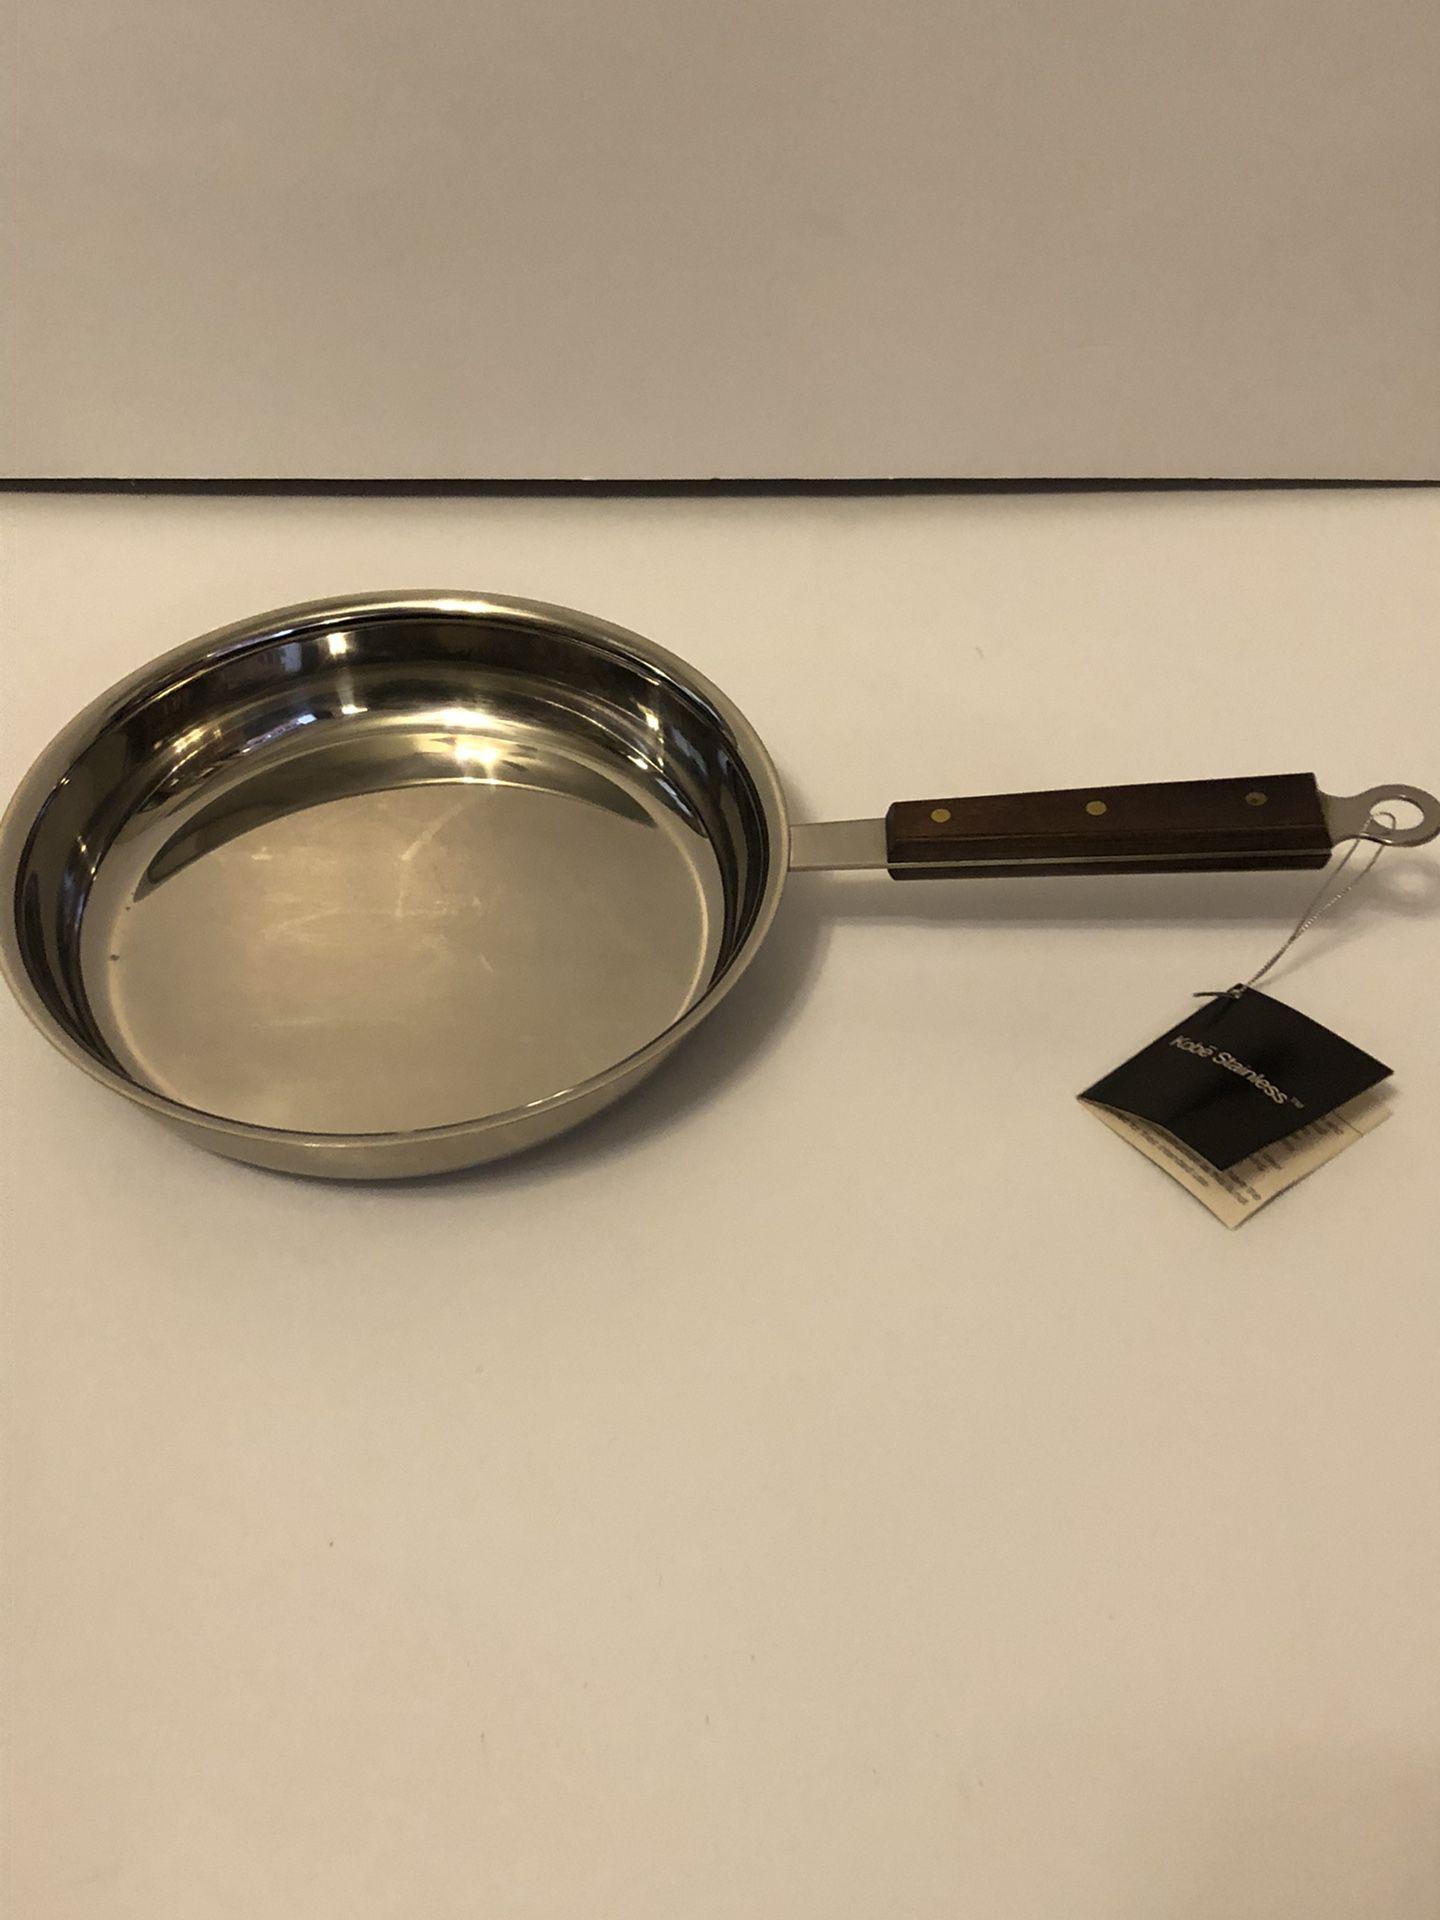 Kobee Stainless Frying Pan